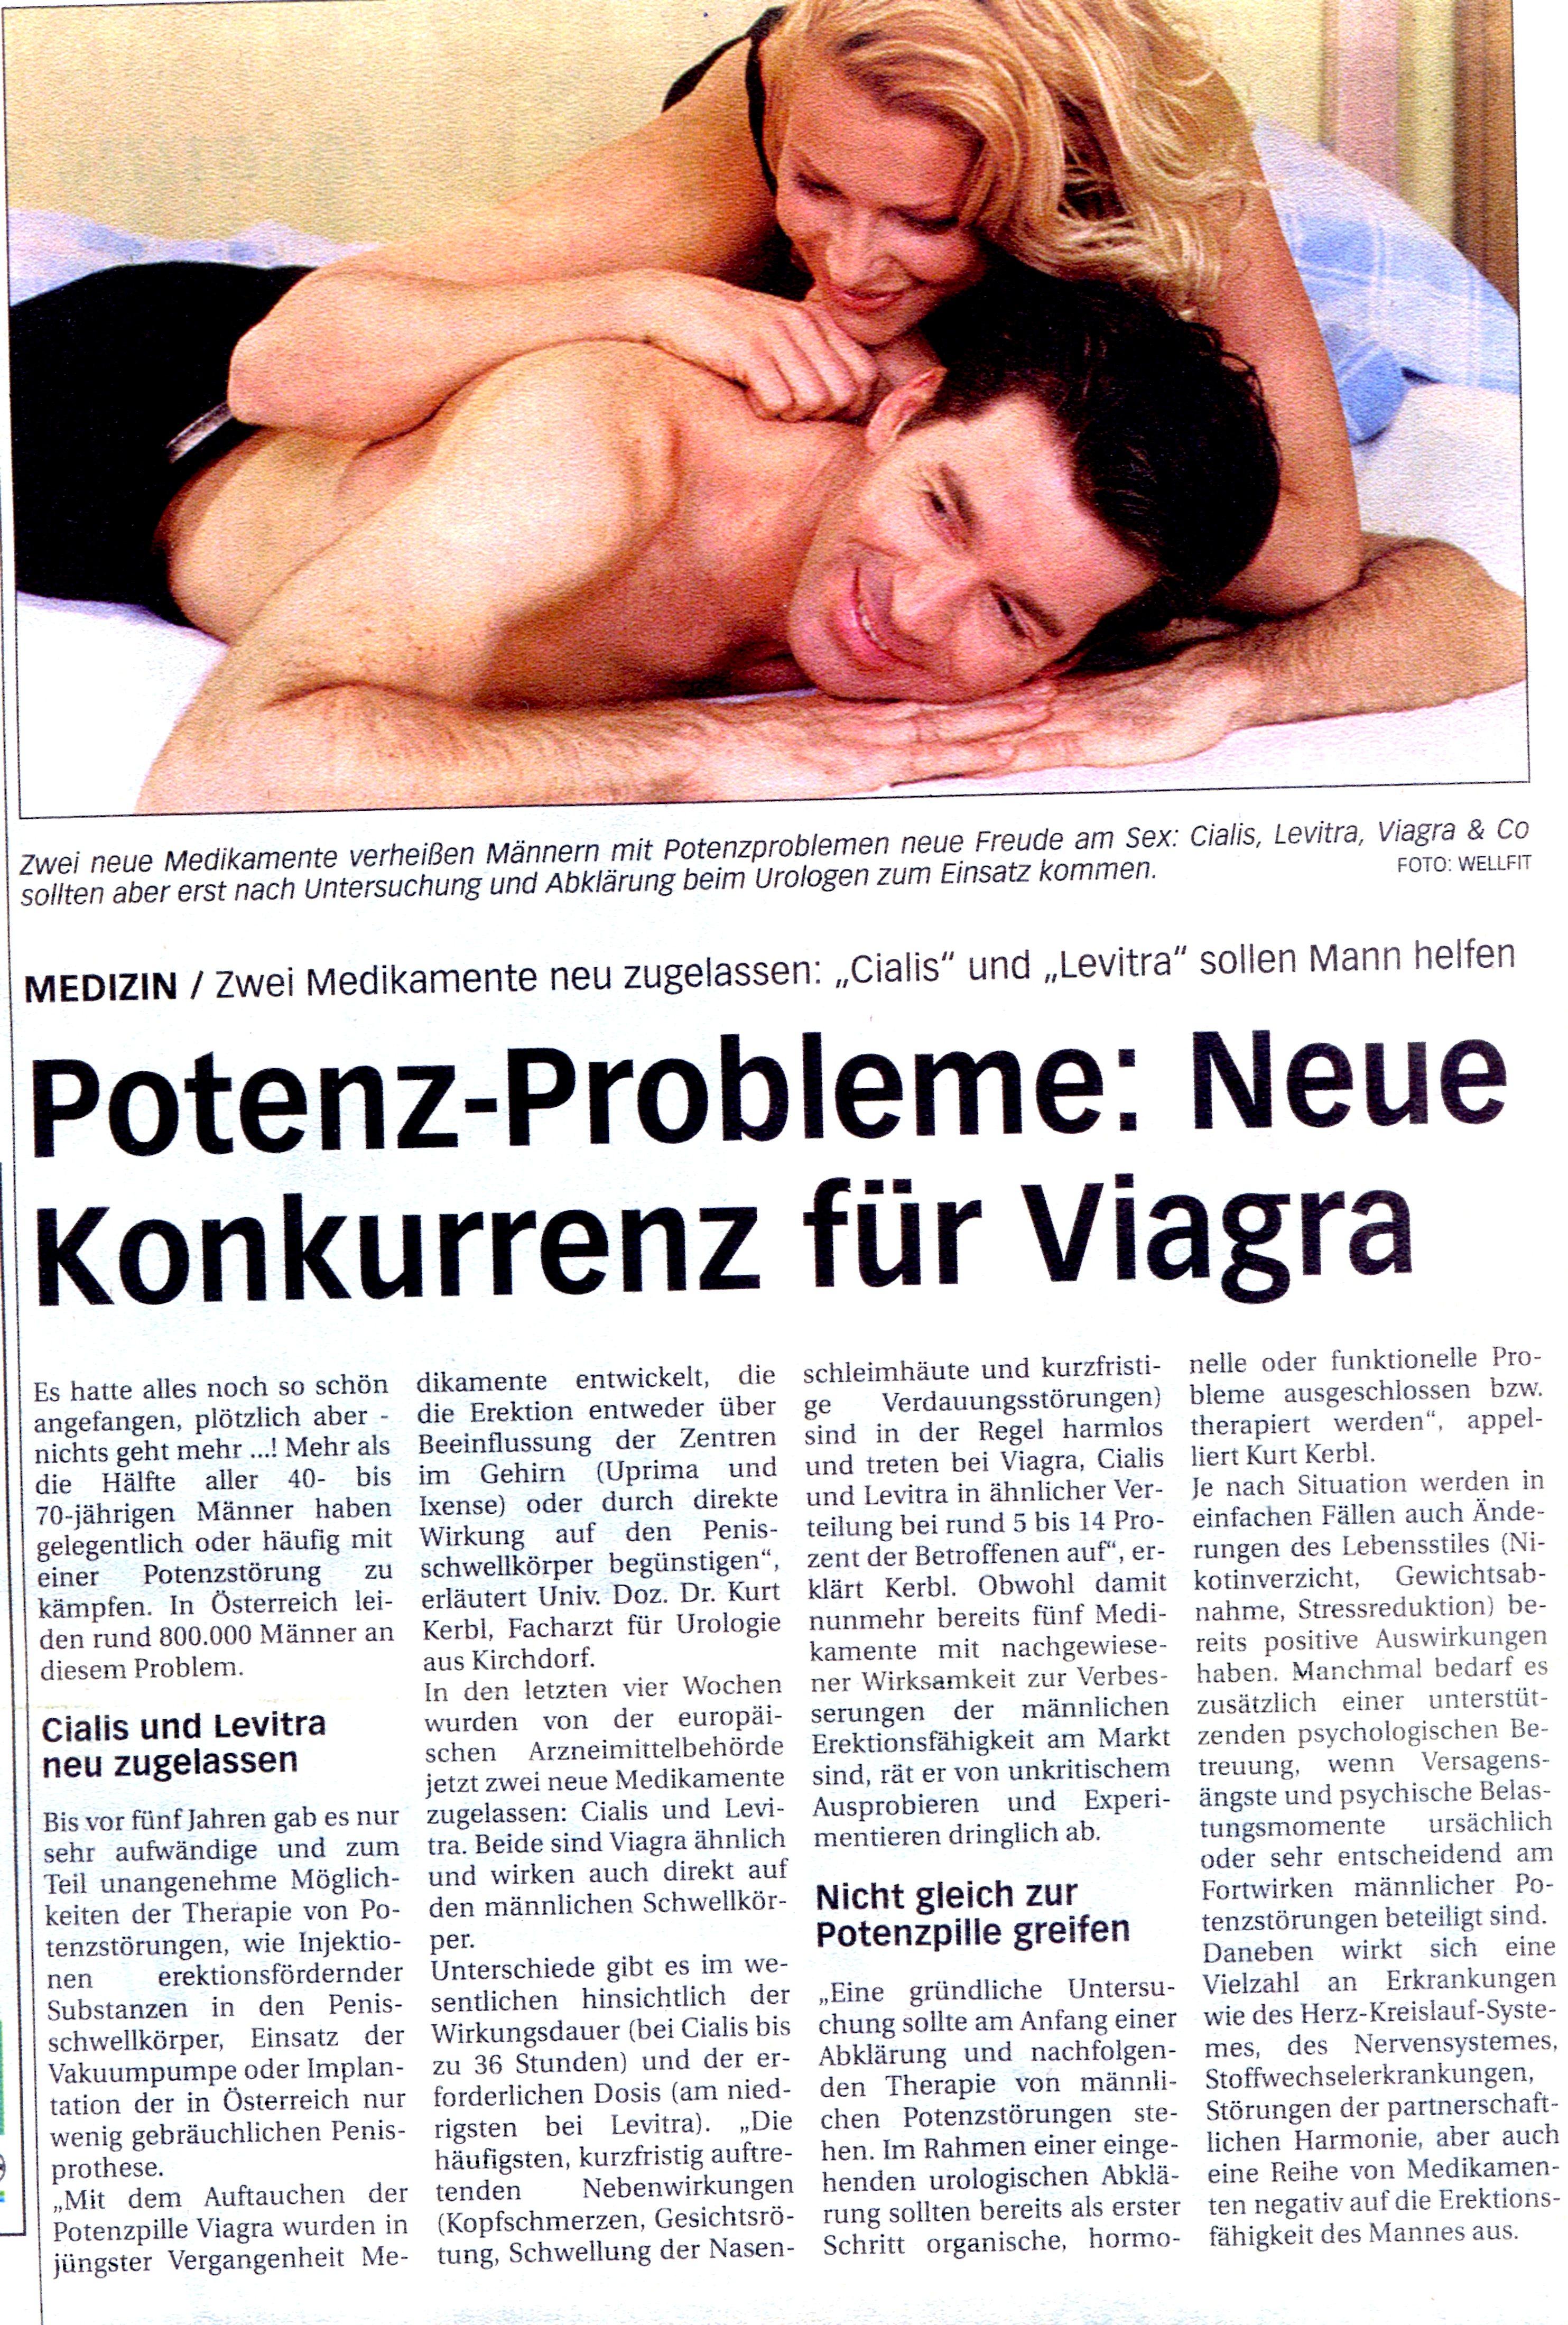 männer untersuchung beim urologen